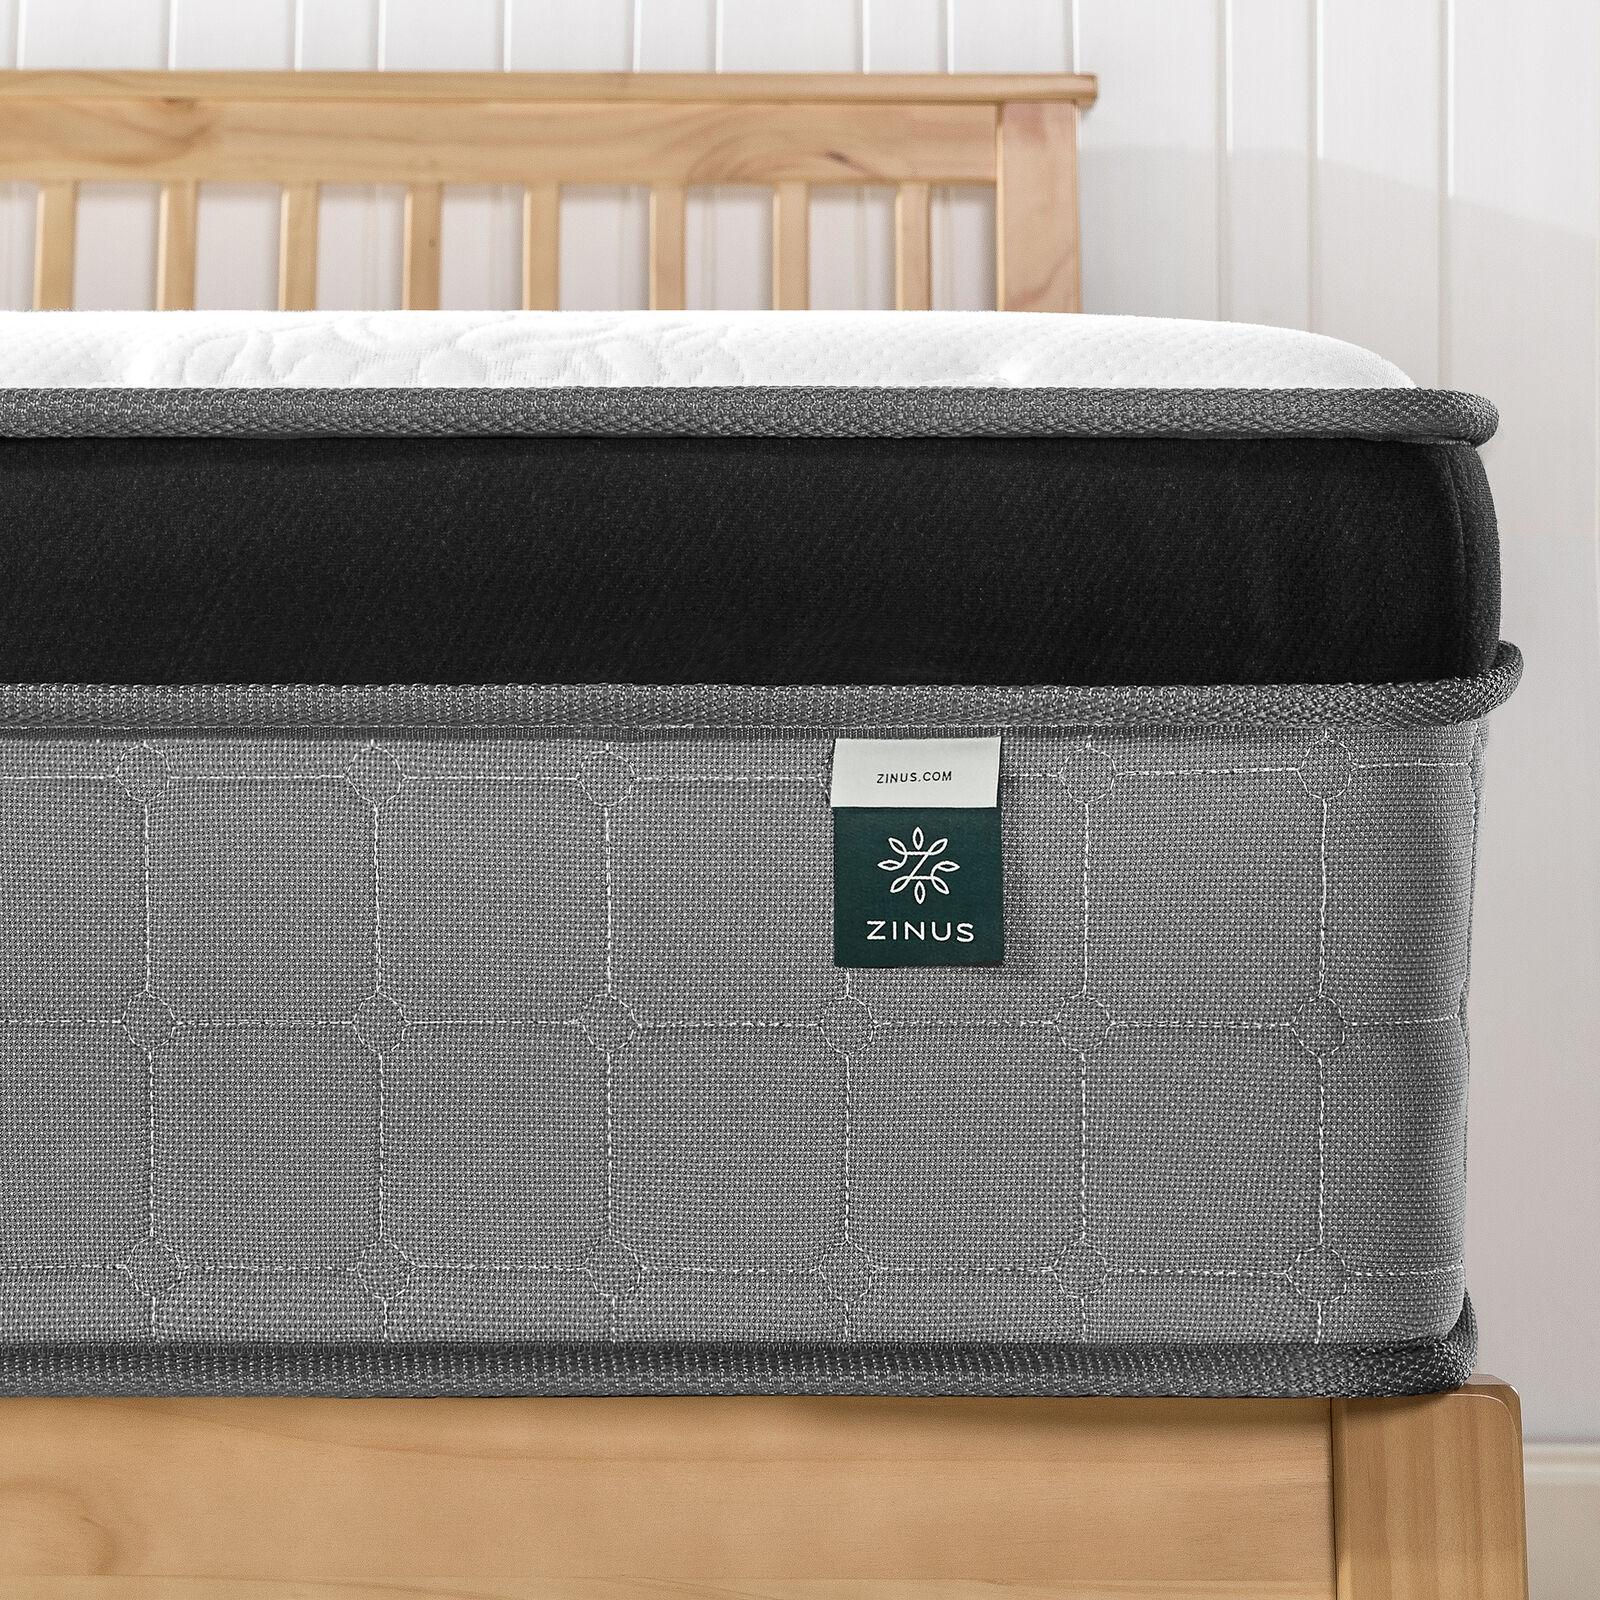 thumbnail 57 - Zinus Mattress Queen Double King Single Bed Memory Foam Pocket Spring Hybrid